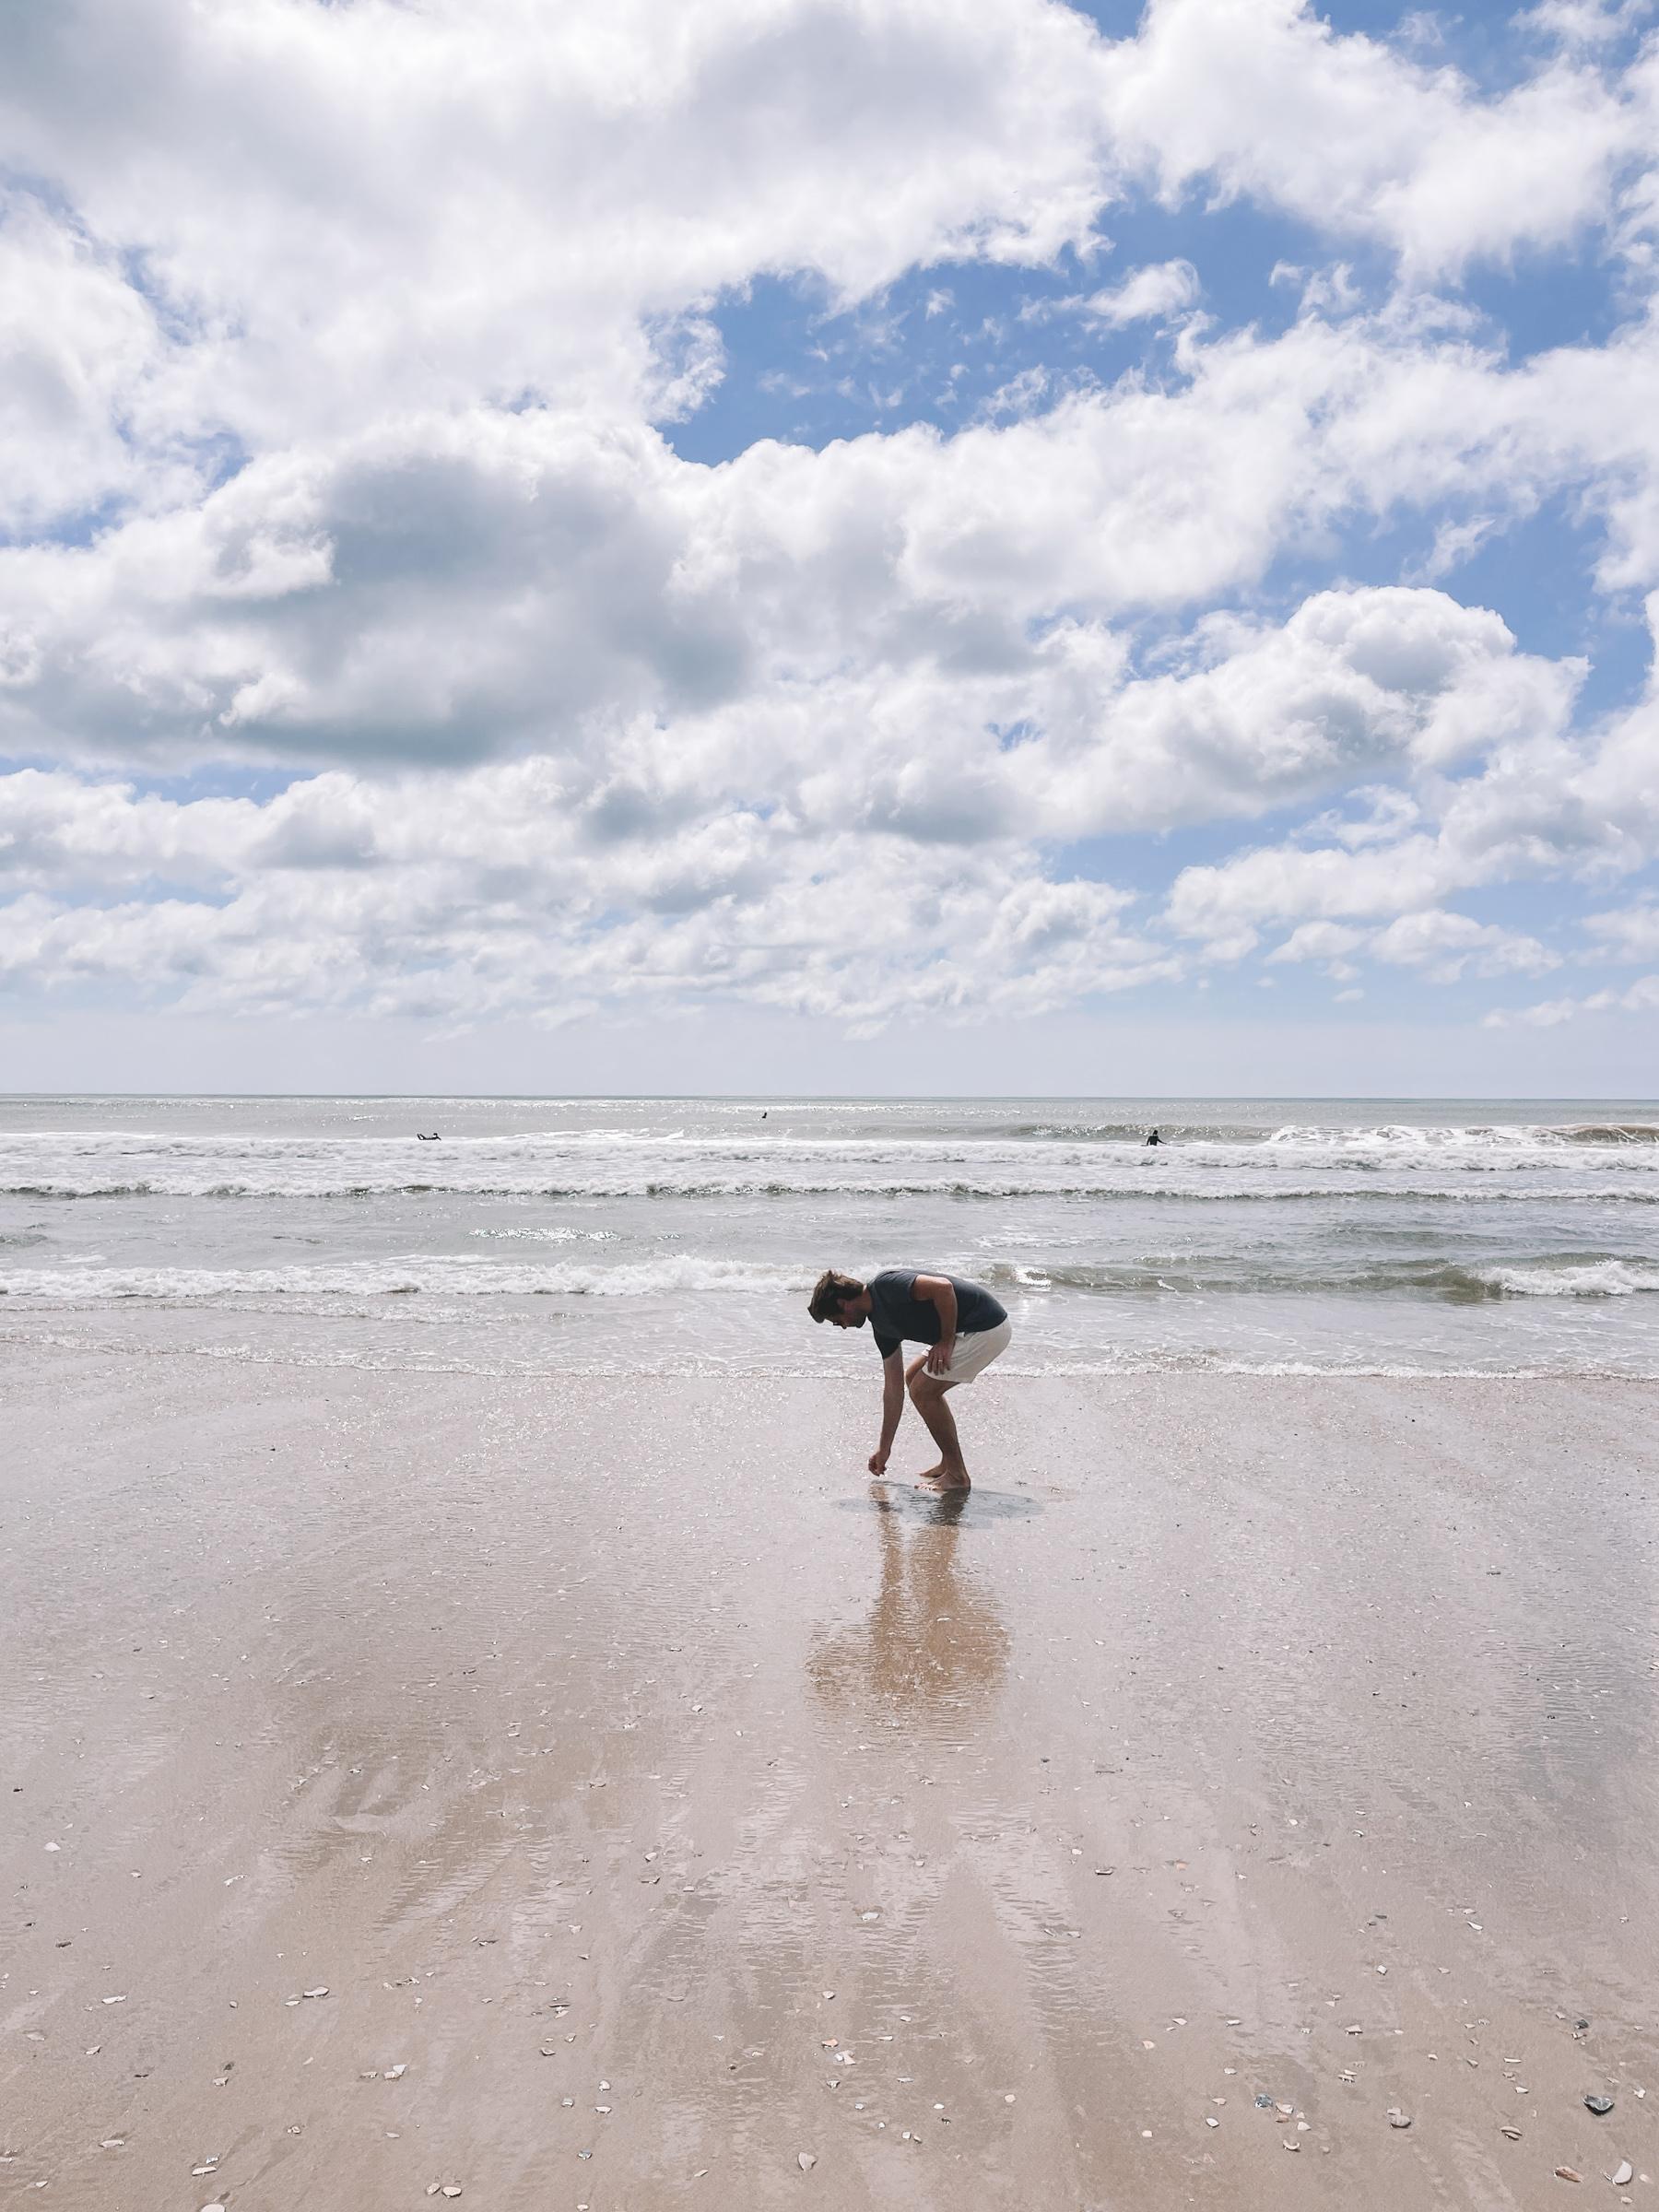 Mitch at the beach